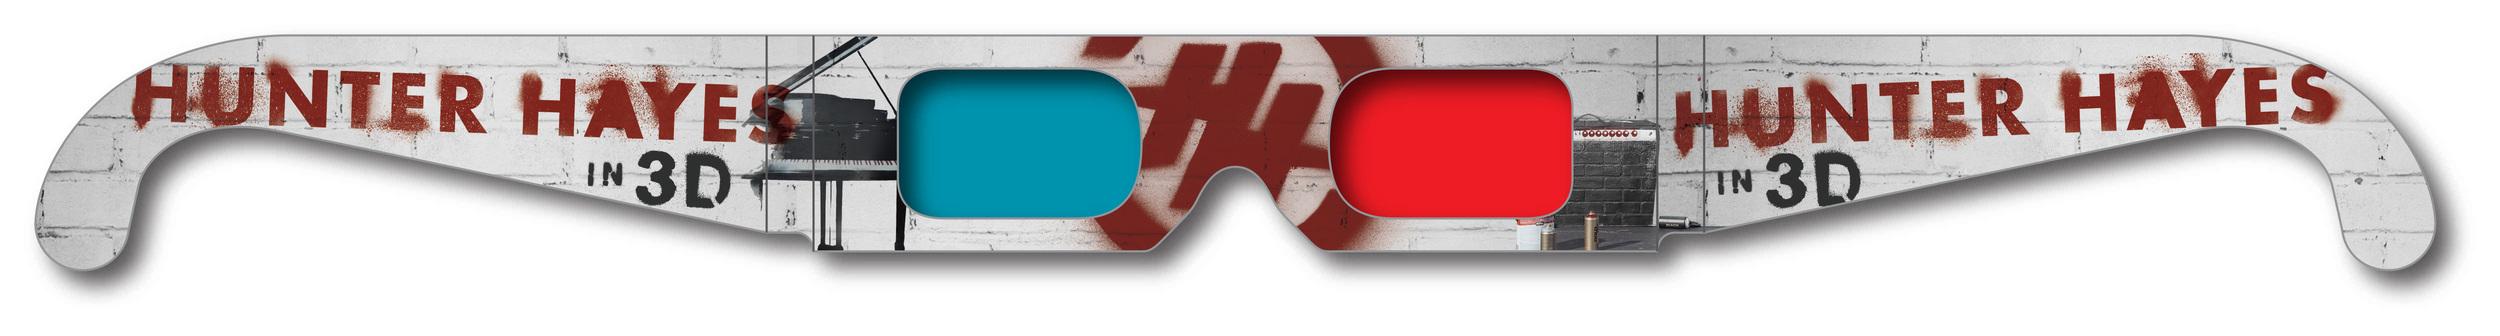 hunter_hayes_custom_anaglyph_glasses